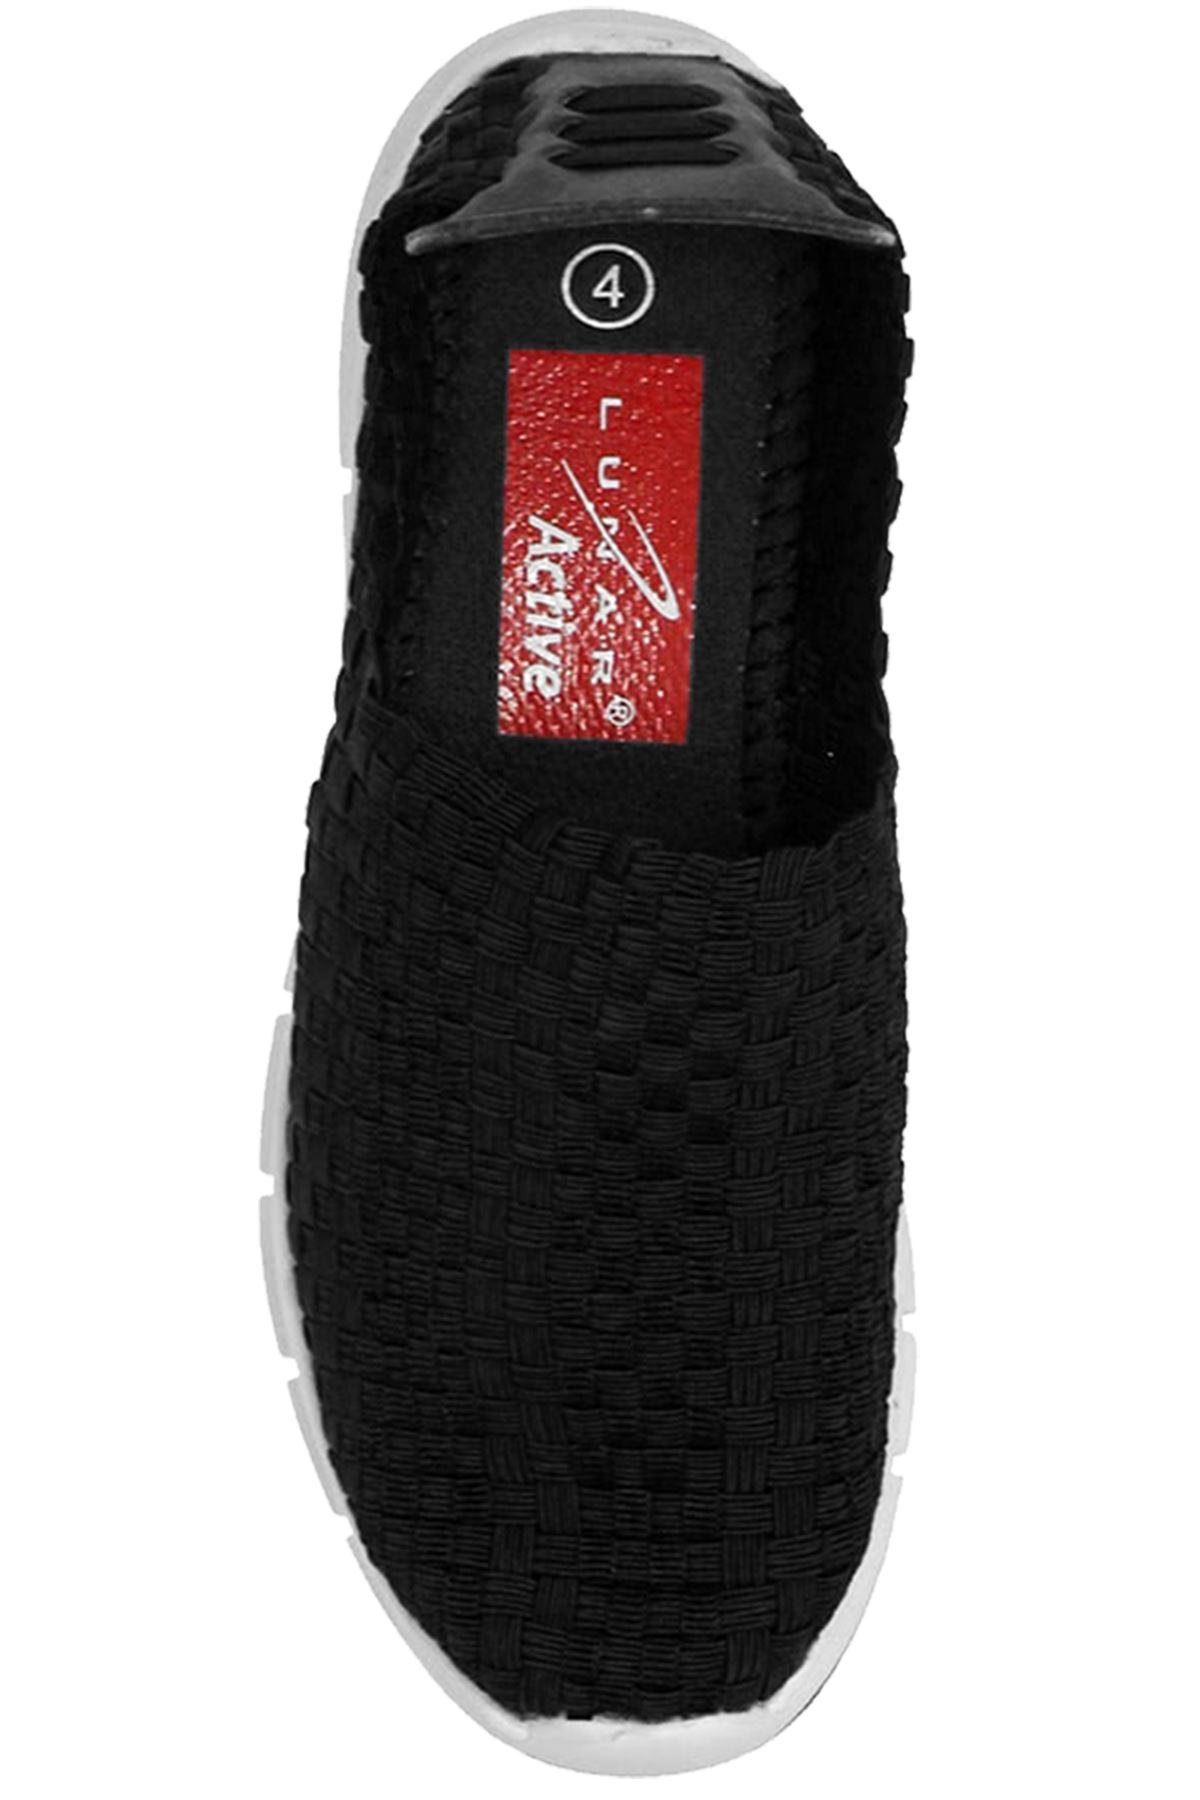 FLK014 Maverick Womens Lightweight Comfortable Shoes Elasticated Trainers